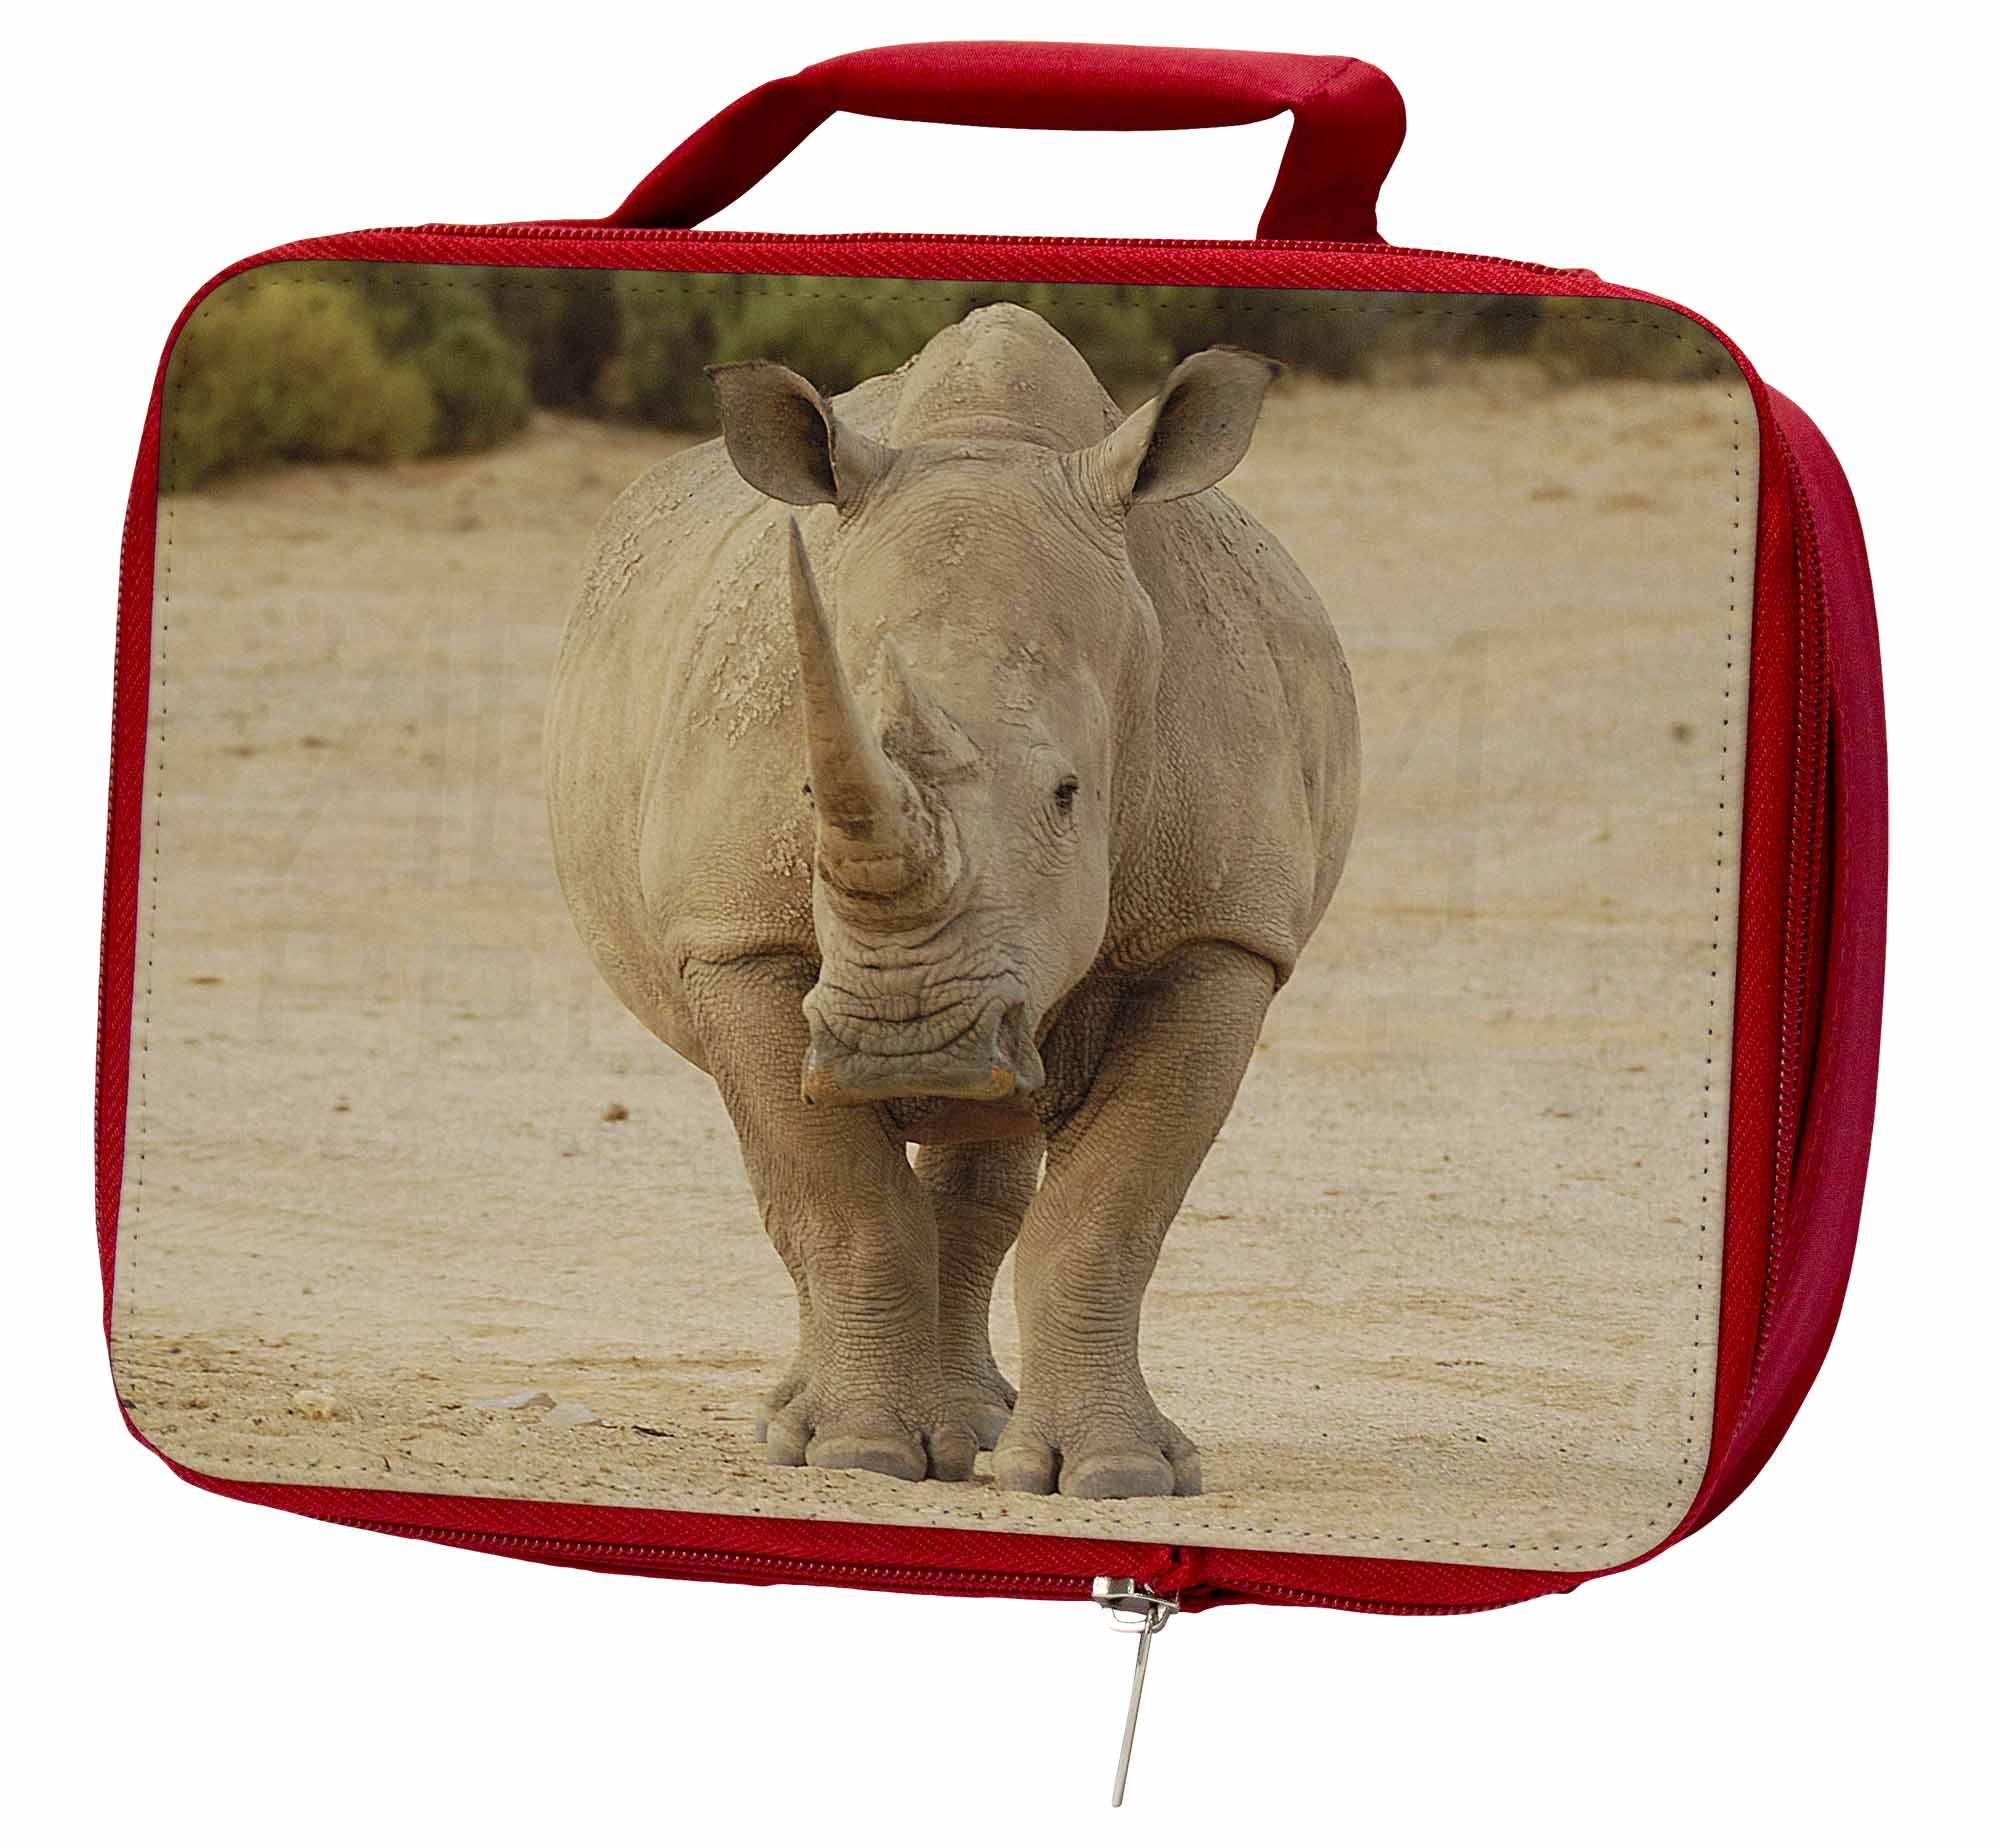 ARH-2LBR Rhinocerous Rhino Insulated Red School Lunch Box//Picnic Bag